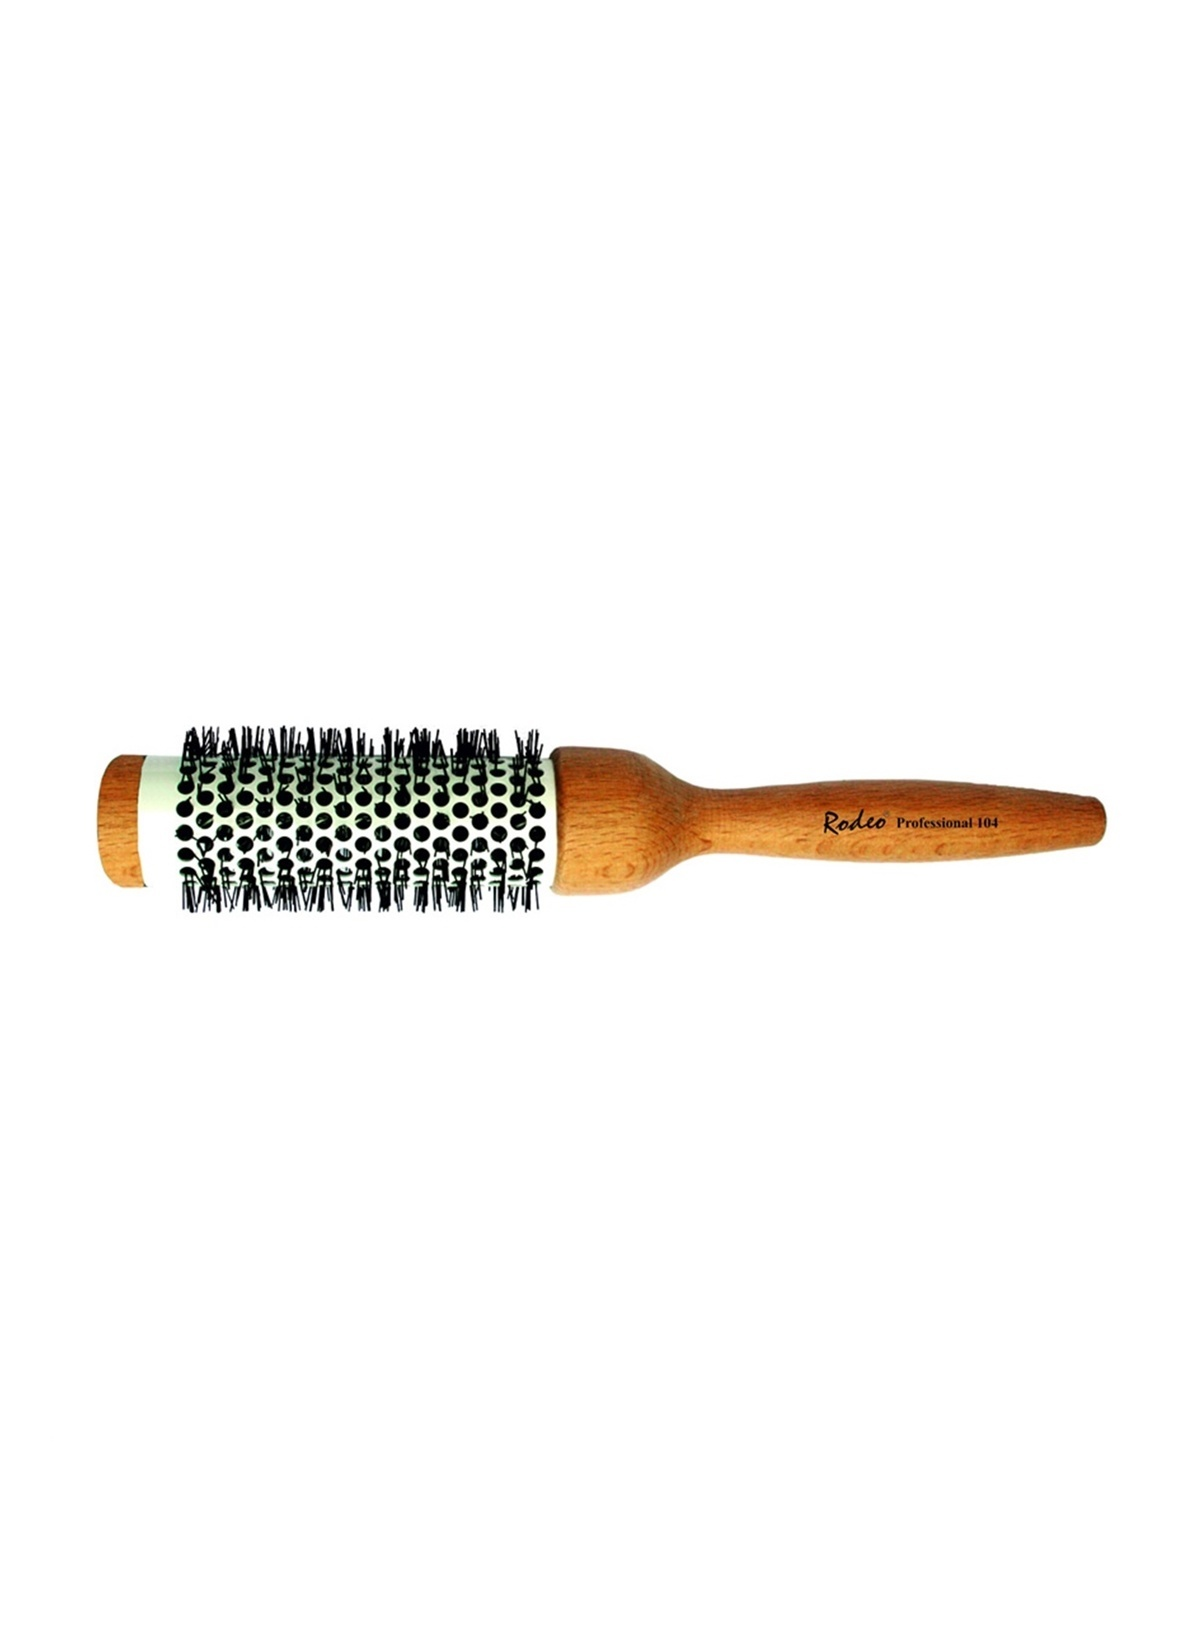 Rodeo Saç Fırçası Ve Tarak Rodeo Professıonal Thermal 104 Pro Saç F – 43.9 TL